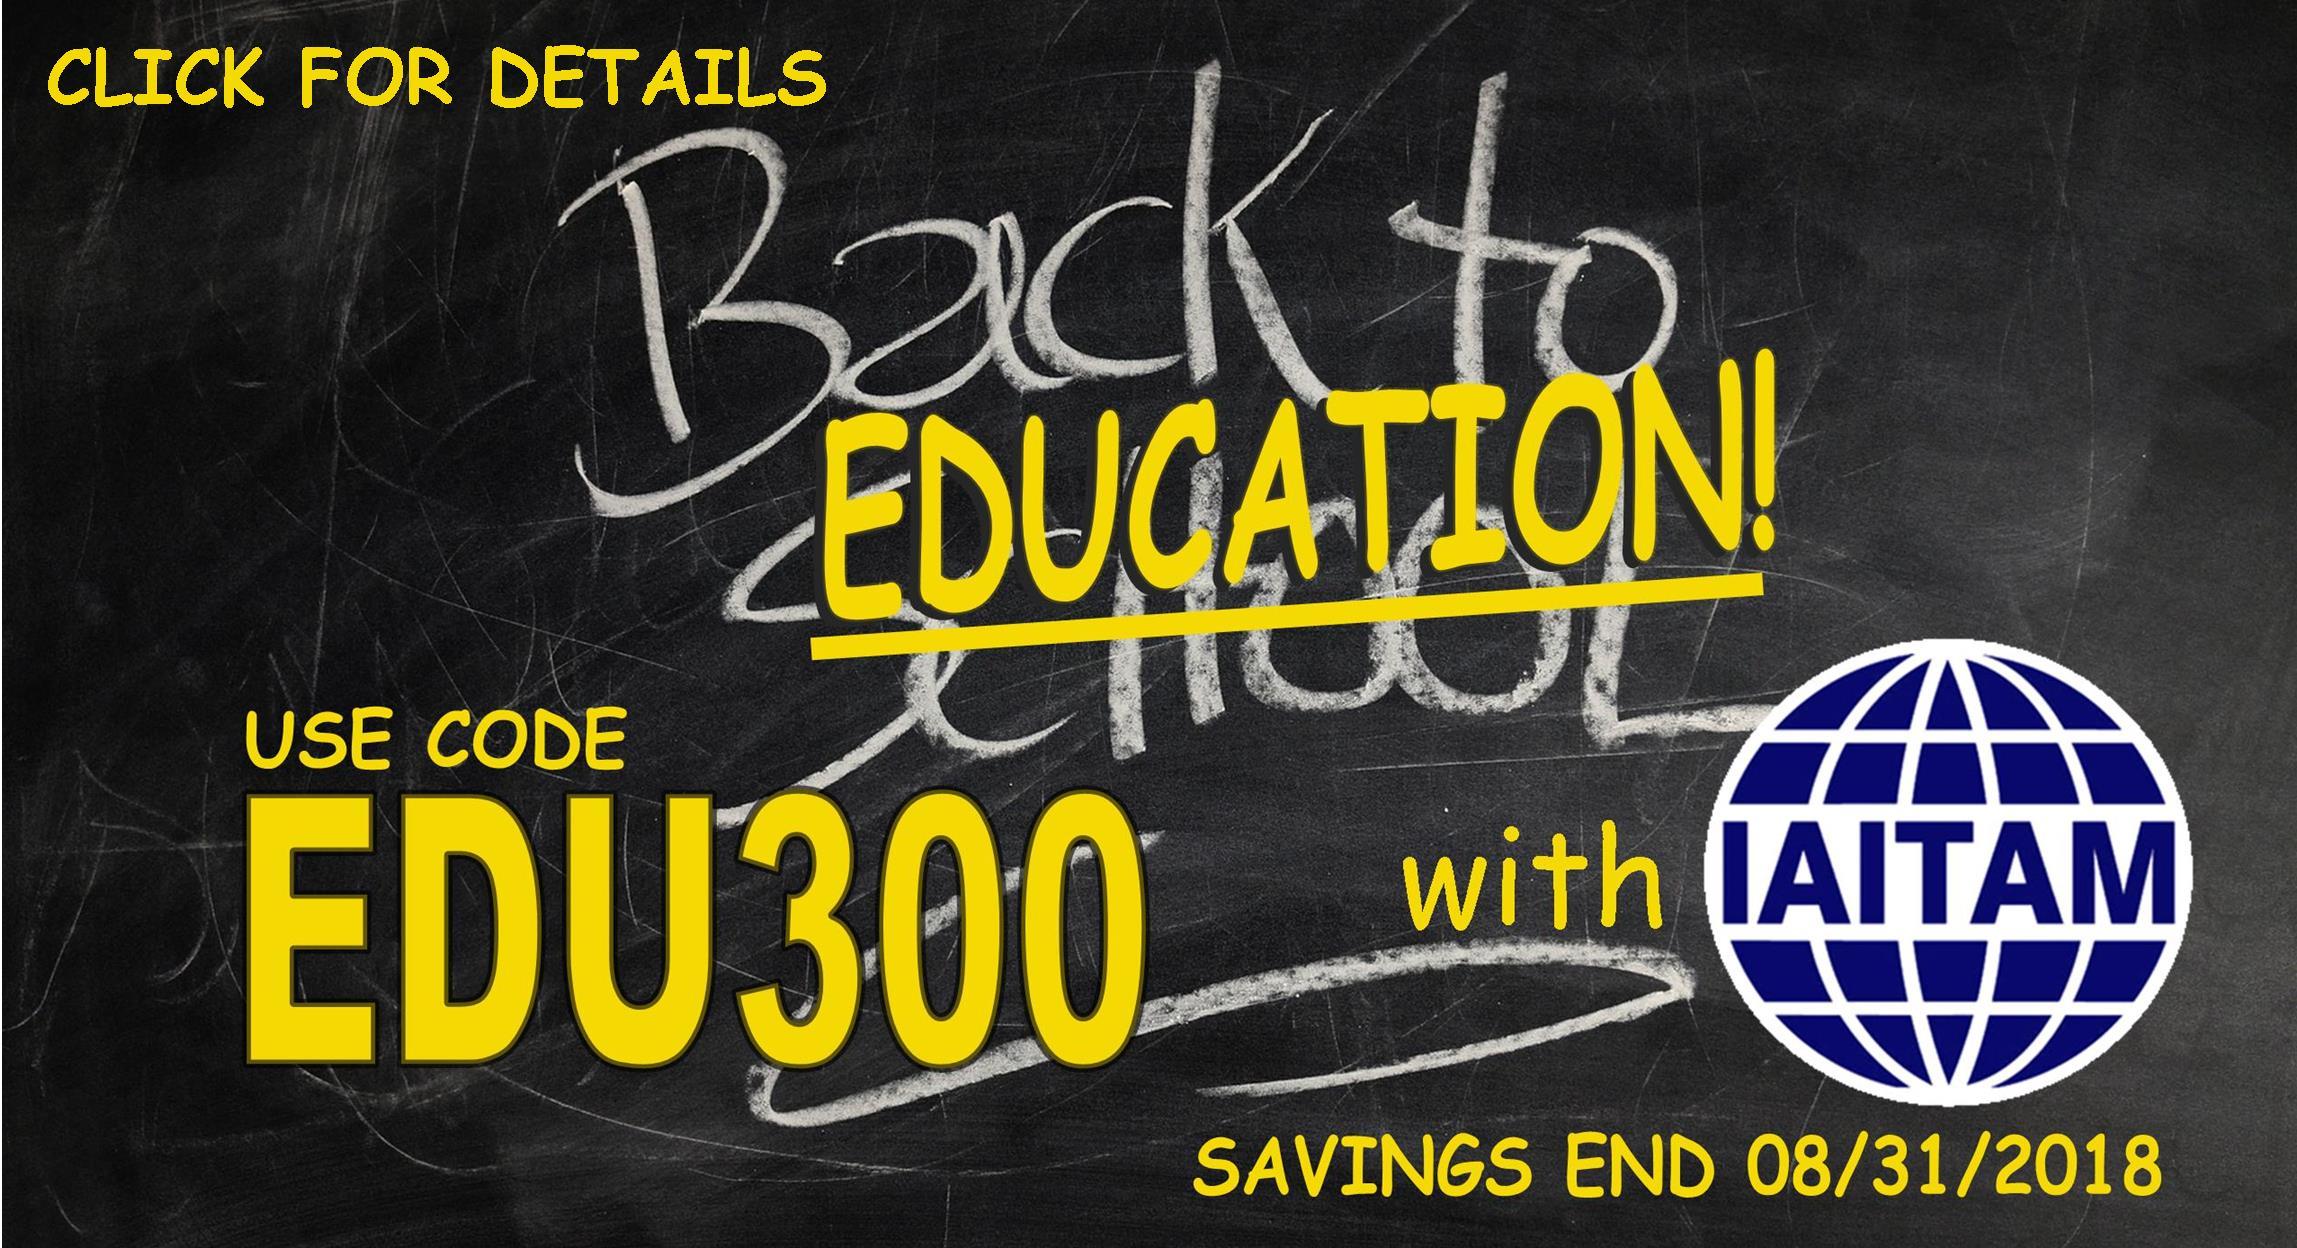 Iaitam itam education membership and conferences itam conference speaker call edu300 special savings malvernweather Gallery